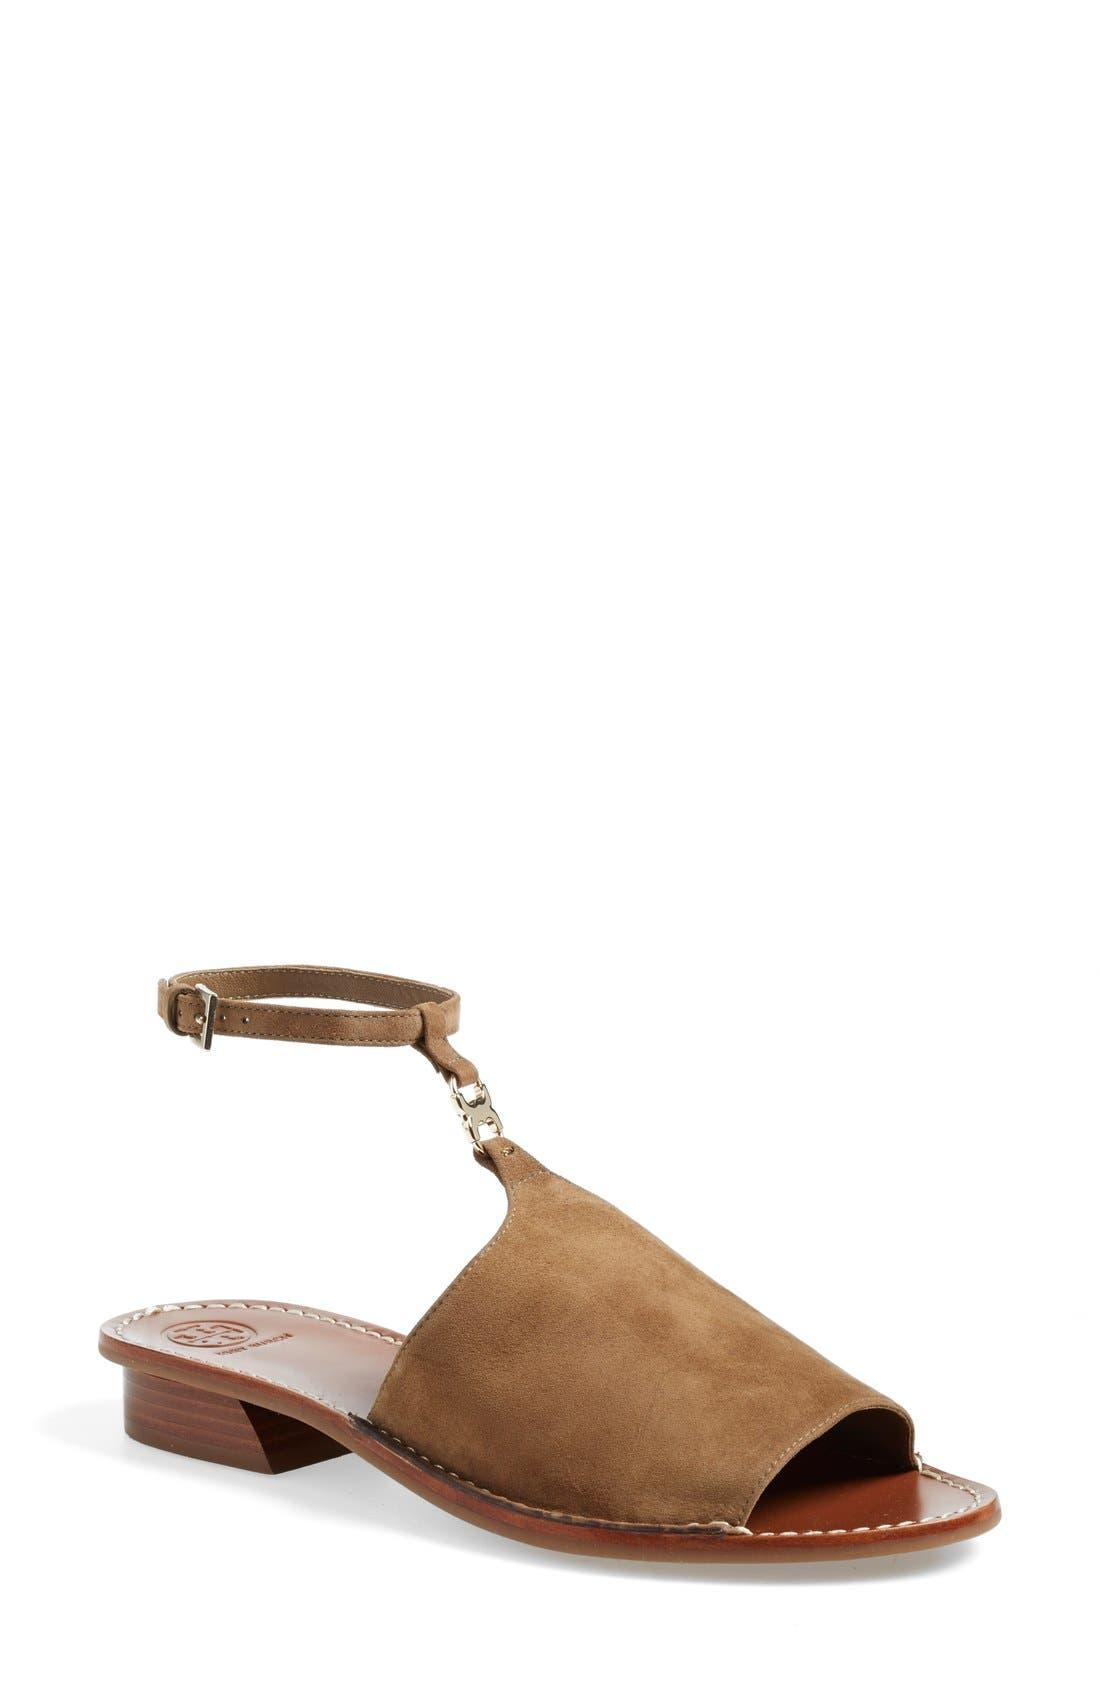 Main Image - Tory Burch 'Gemini Link' Ankle Strap Sandal (Women)